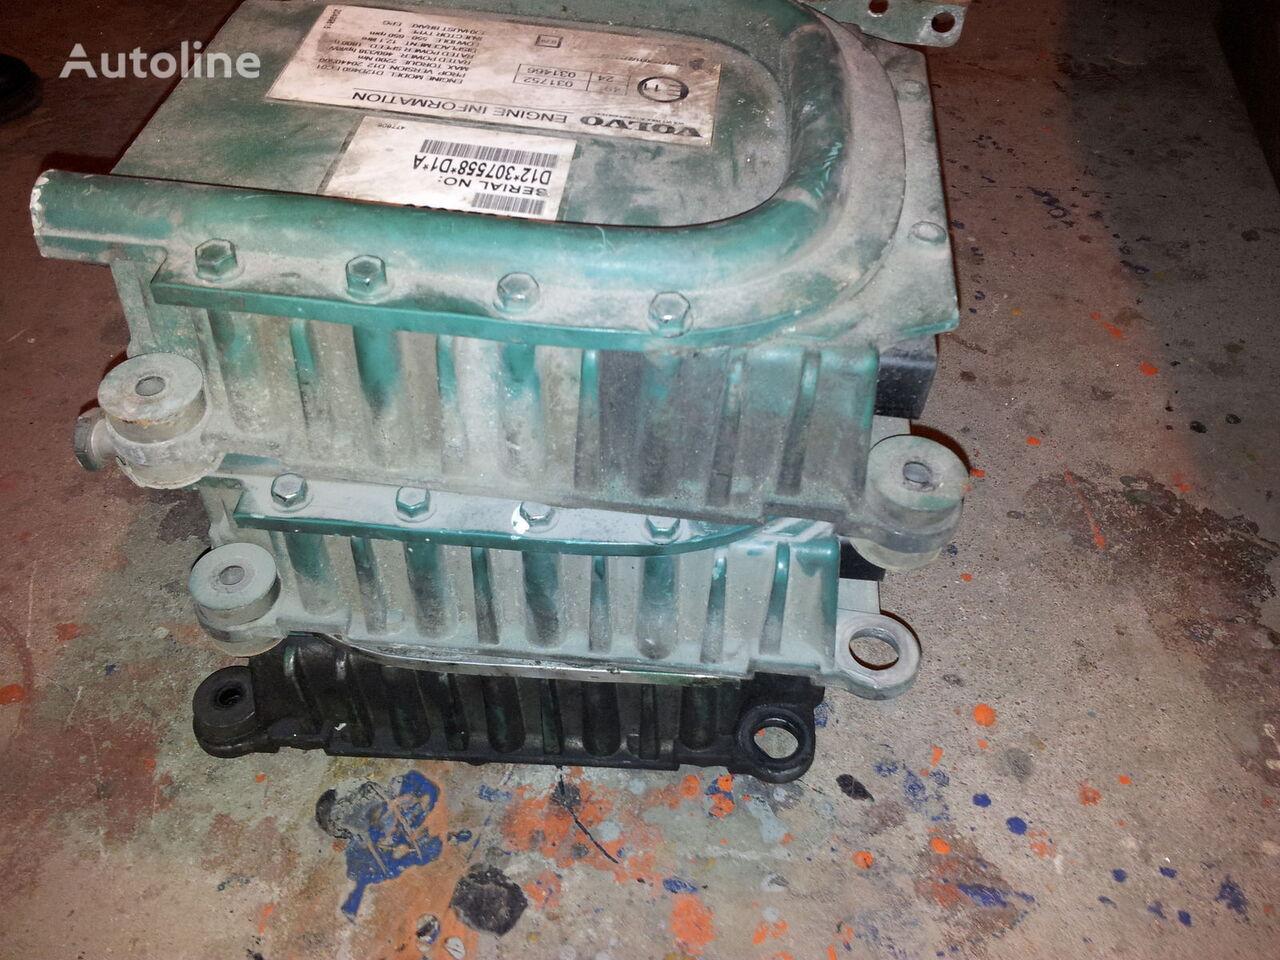 VOLVO FH12, EURO3 D12D ECU engine control unit 460PS; 420PS; 20440501; 20440500, 3161962, 20577131, 85107712, 85000086, 85000388, 20582958, 85111405, 85107712 bloco de controlo para VOLVO FH12 camião tractor